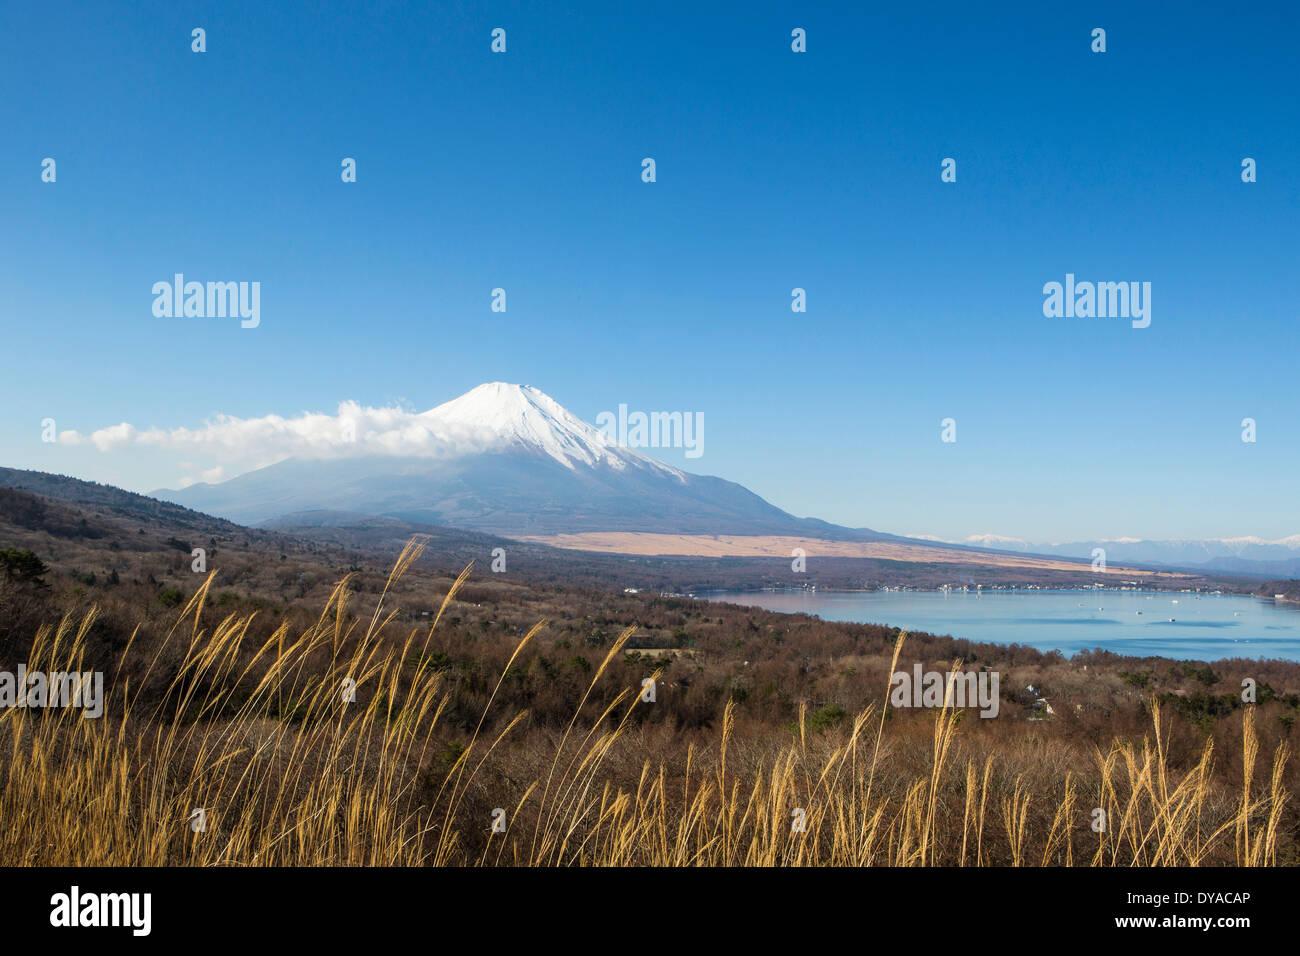 Japan, Asien, Yamanaka-See, Yamanaka, klar, Fuji, See, Berg, Panorama, Schnee, Tourismus, Reisen Stockbild